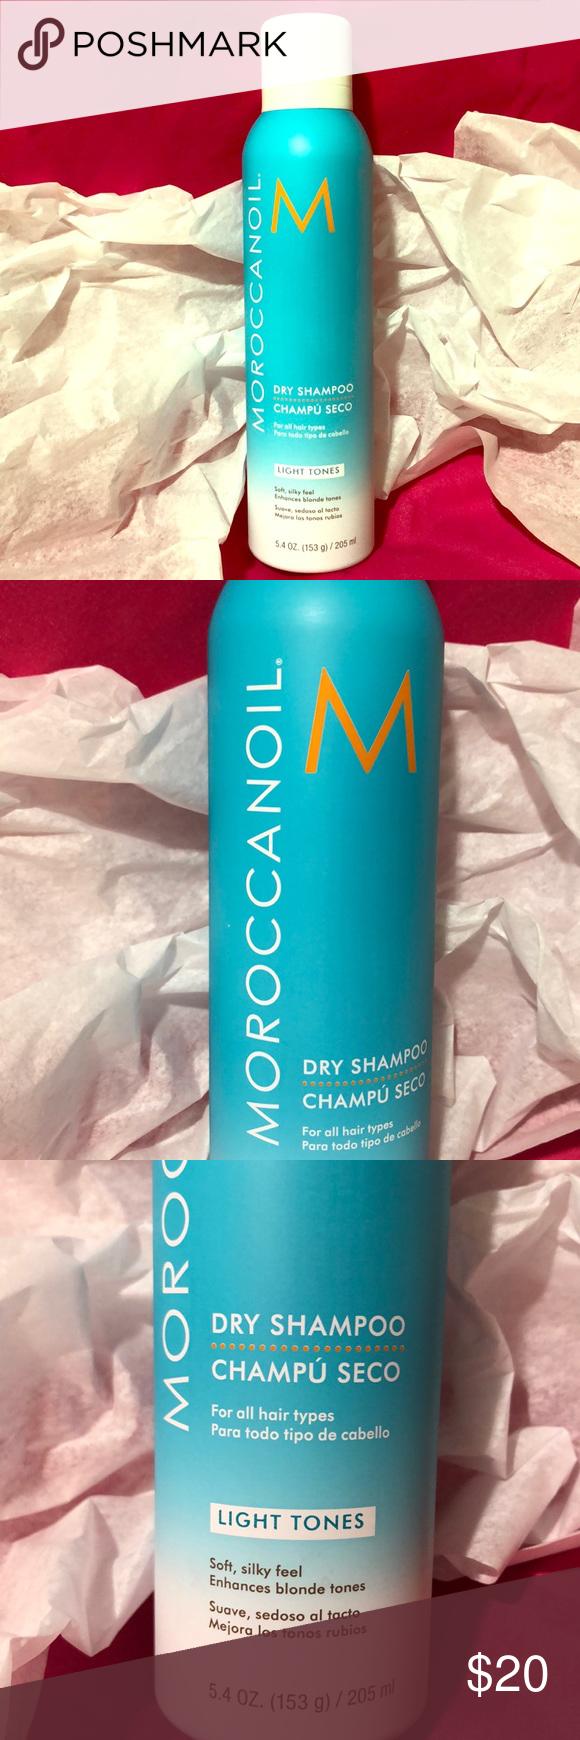 Moroccanoil Dry Shampoo Light Tones Moroccanoil Dry Shampoo Moroccan Oil Dry Shampoo